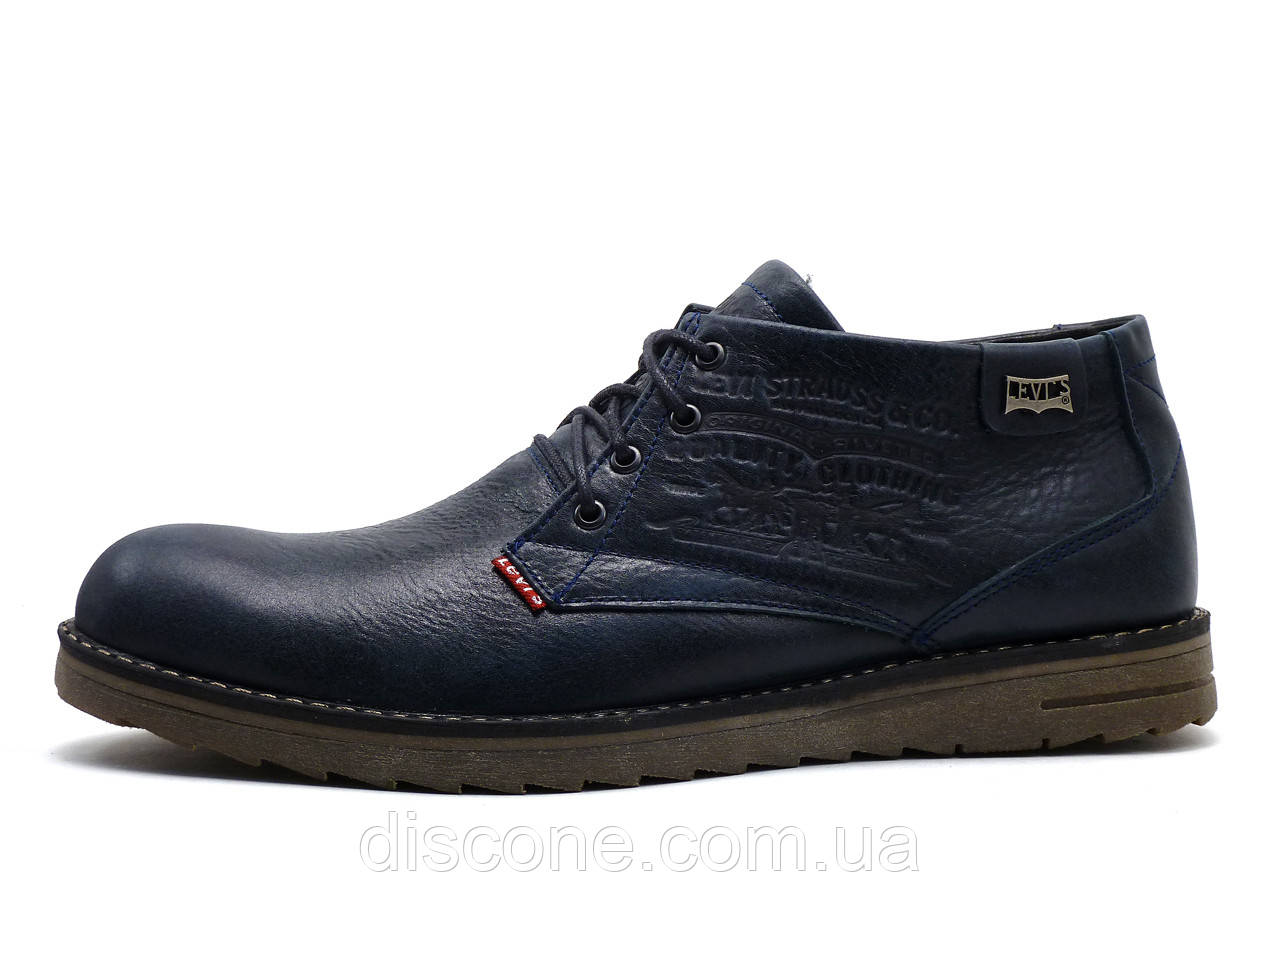 Ботинки Levi's, мужские, натуральная кожа, на меху, темно-синие